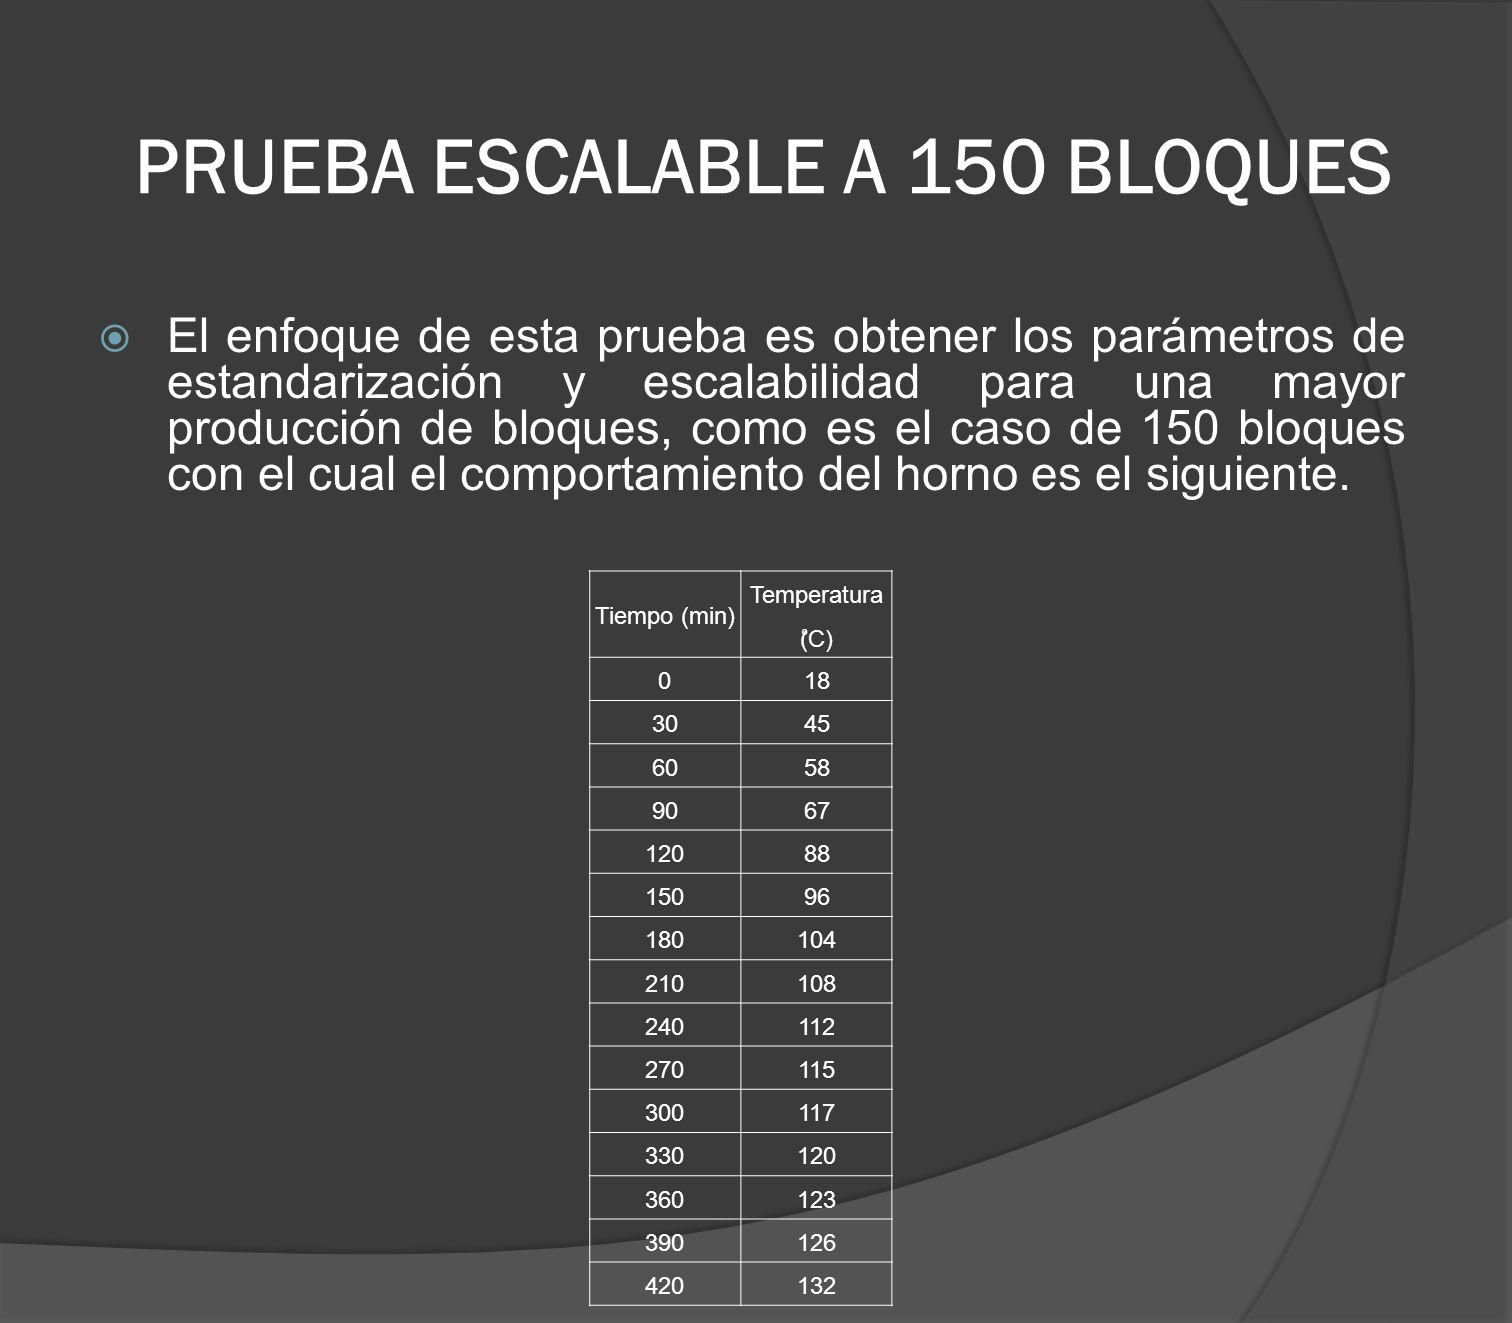 PRUEBA ESCALABLE A 150 BLOQUES